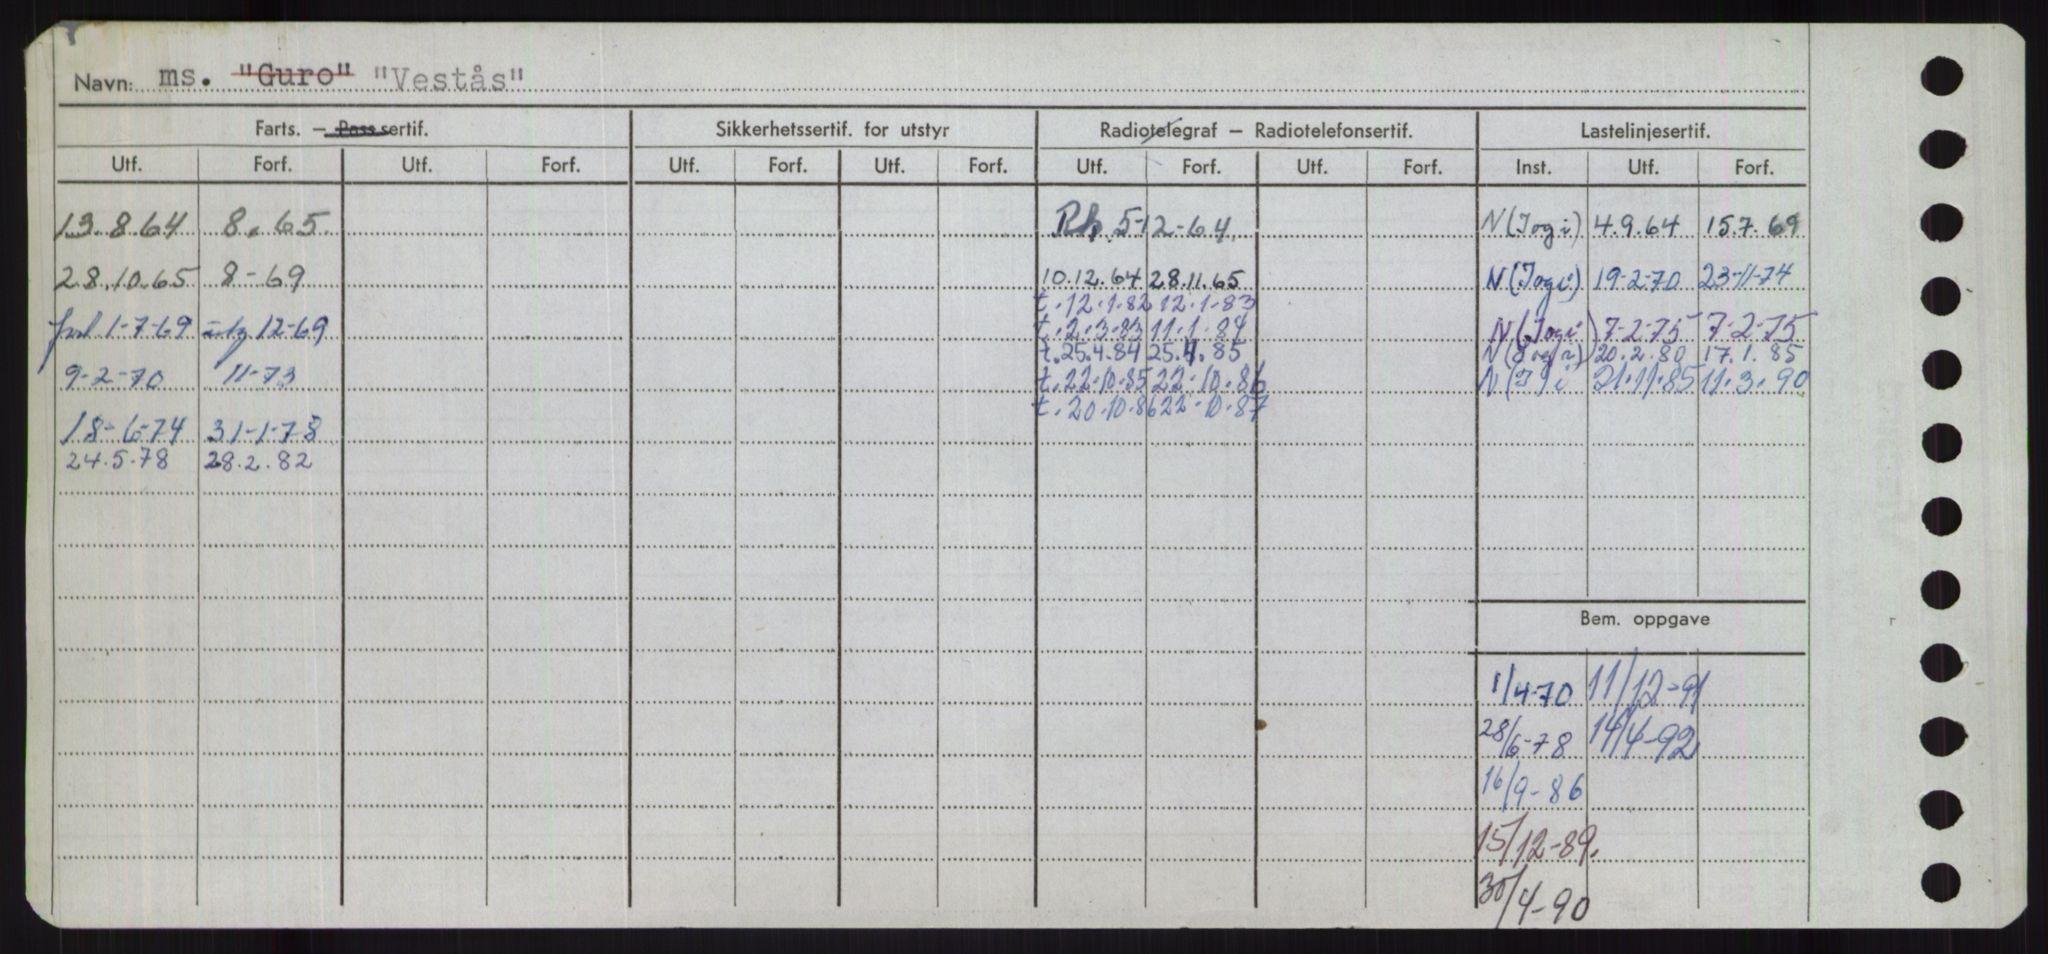 RA, Sjøfartsdirektoratet med forløpere, Skipsmålingen, H/Ha/L0006: Fartøy, Sver-Å, s. 386